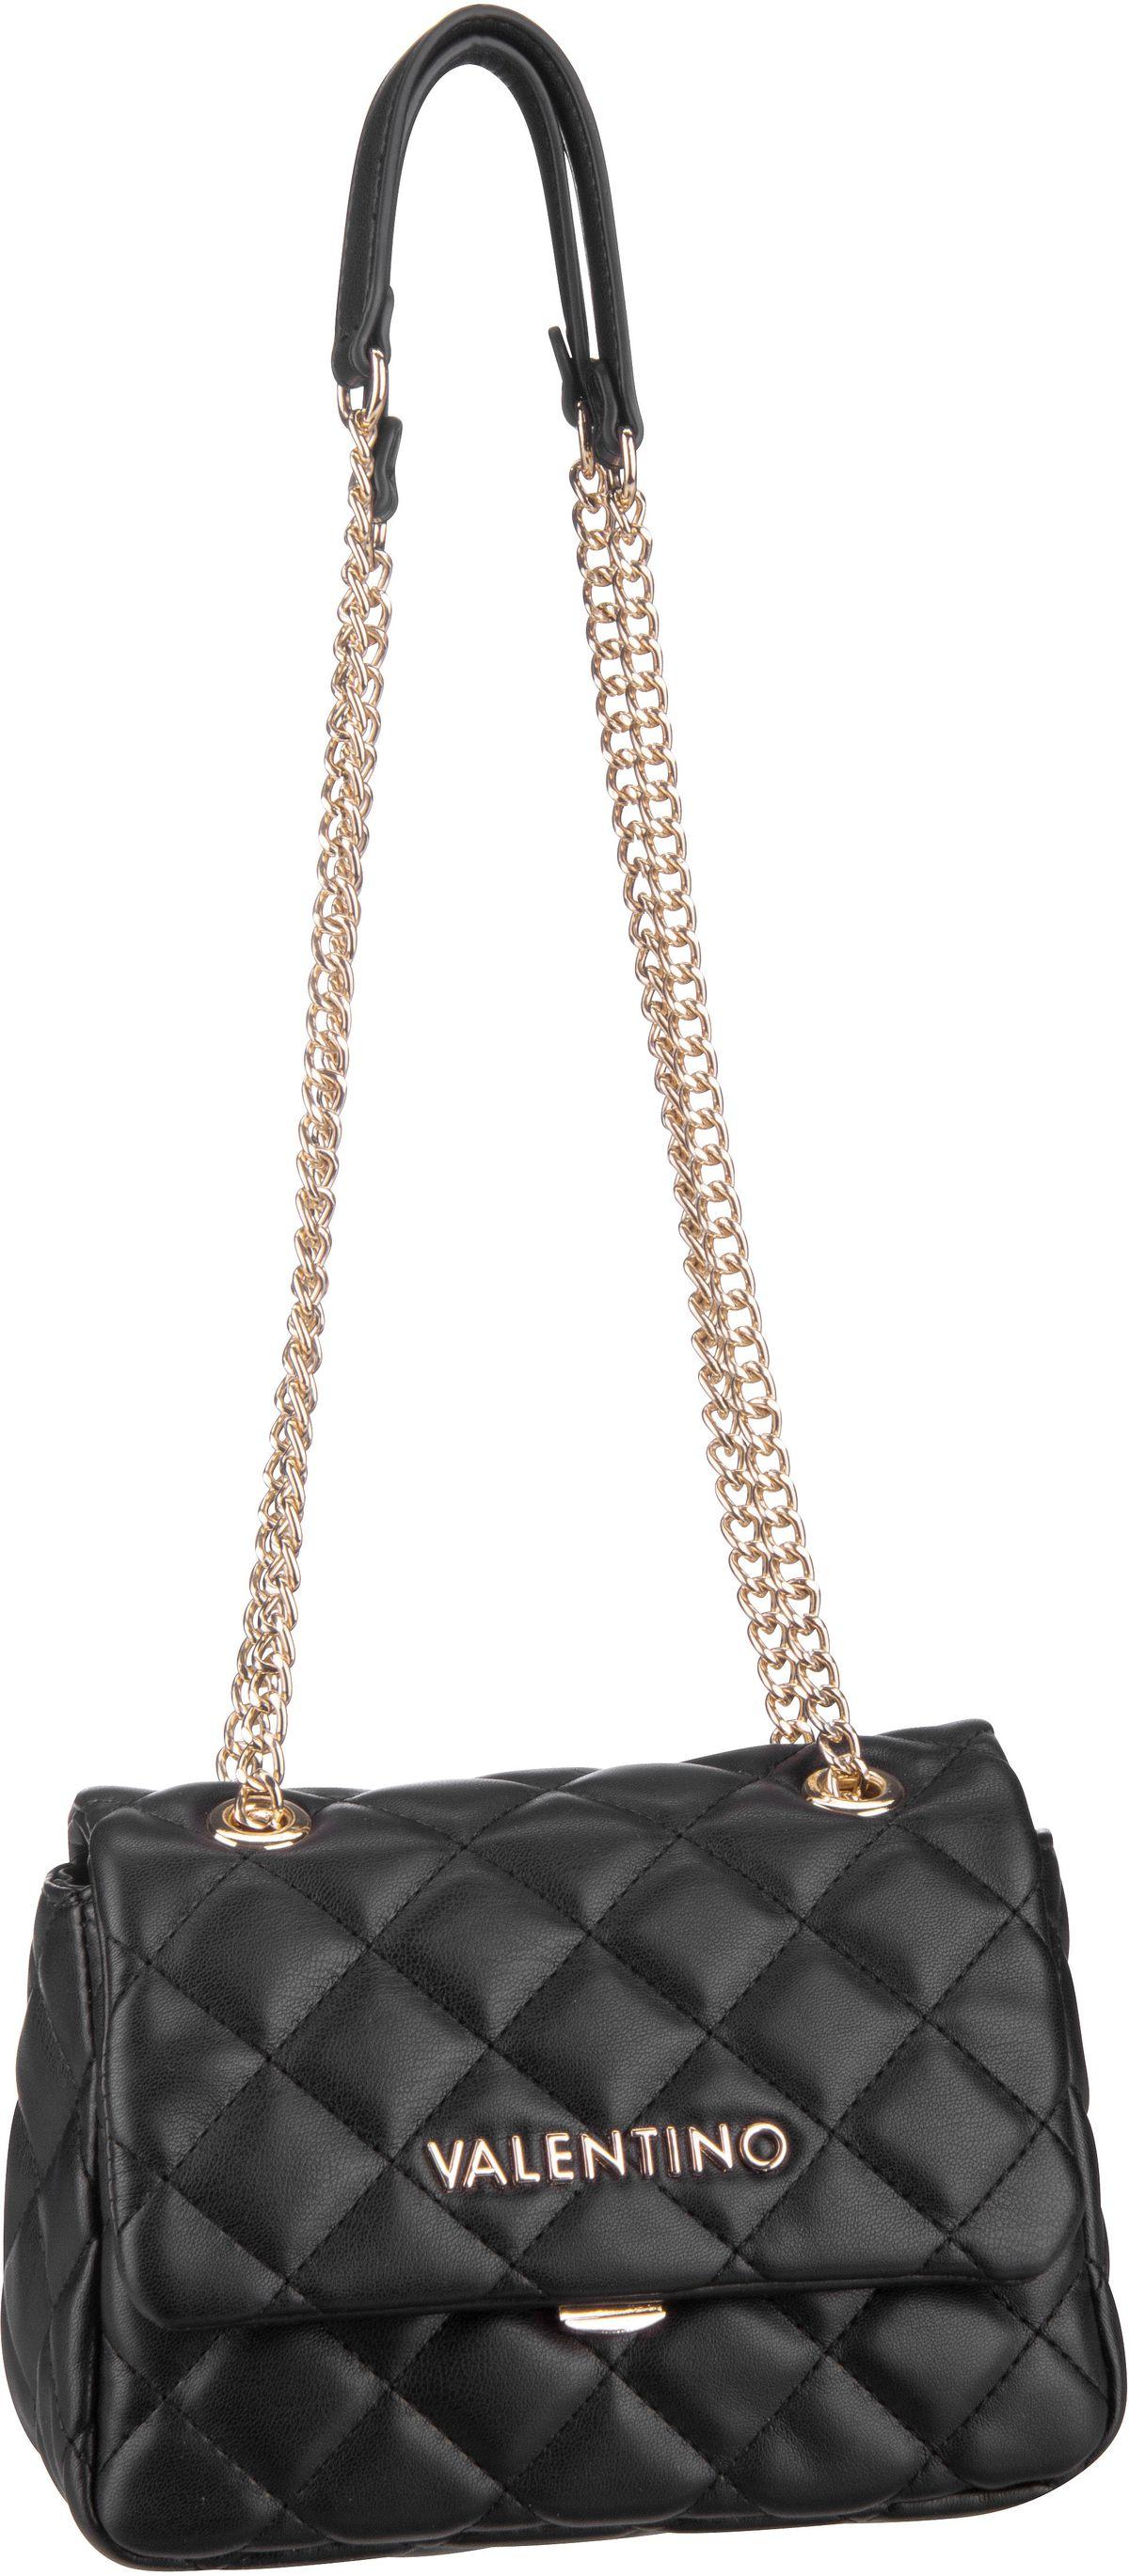 Bags Handtasche Ocarina Pattina K05 Nero